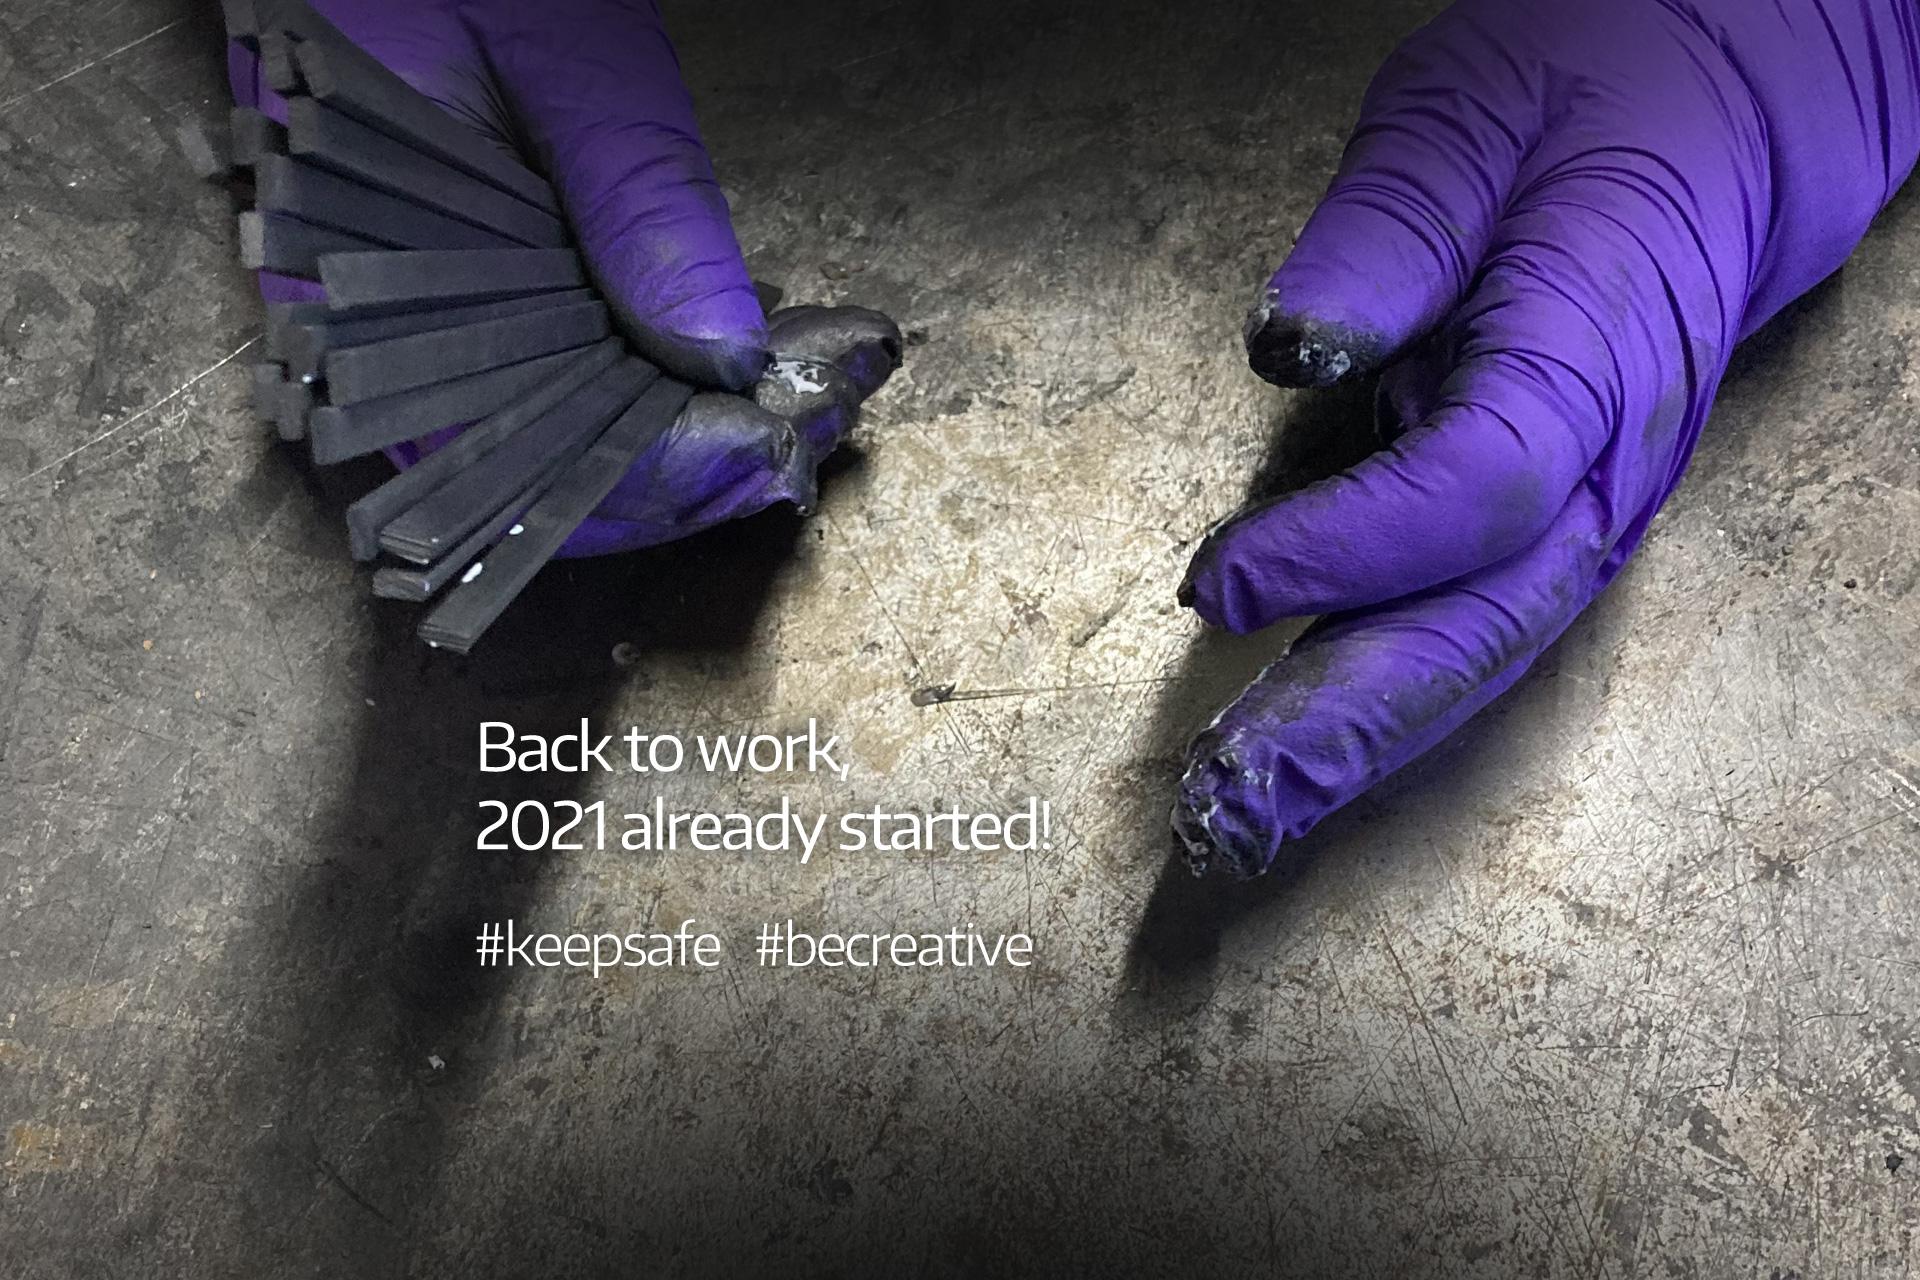 back2work 2021